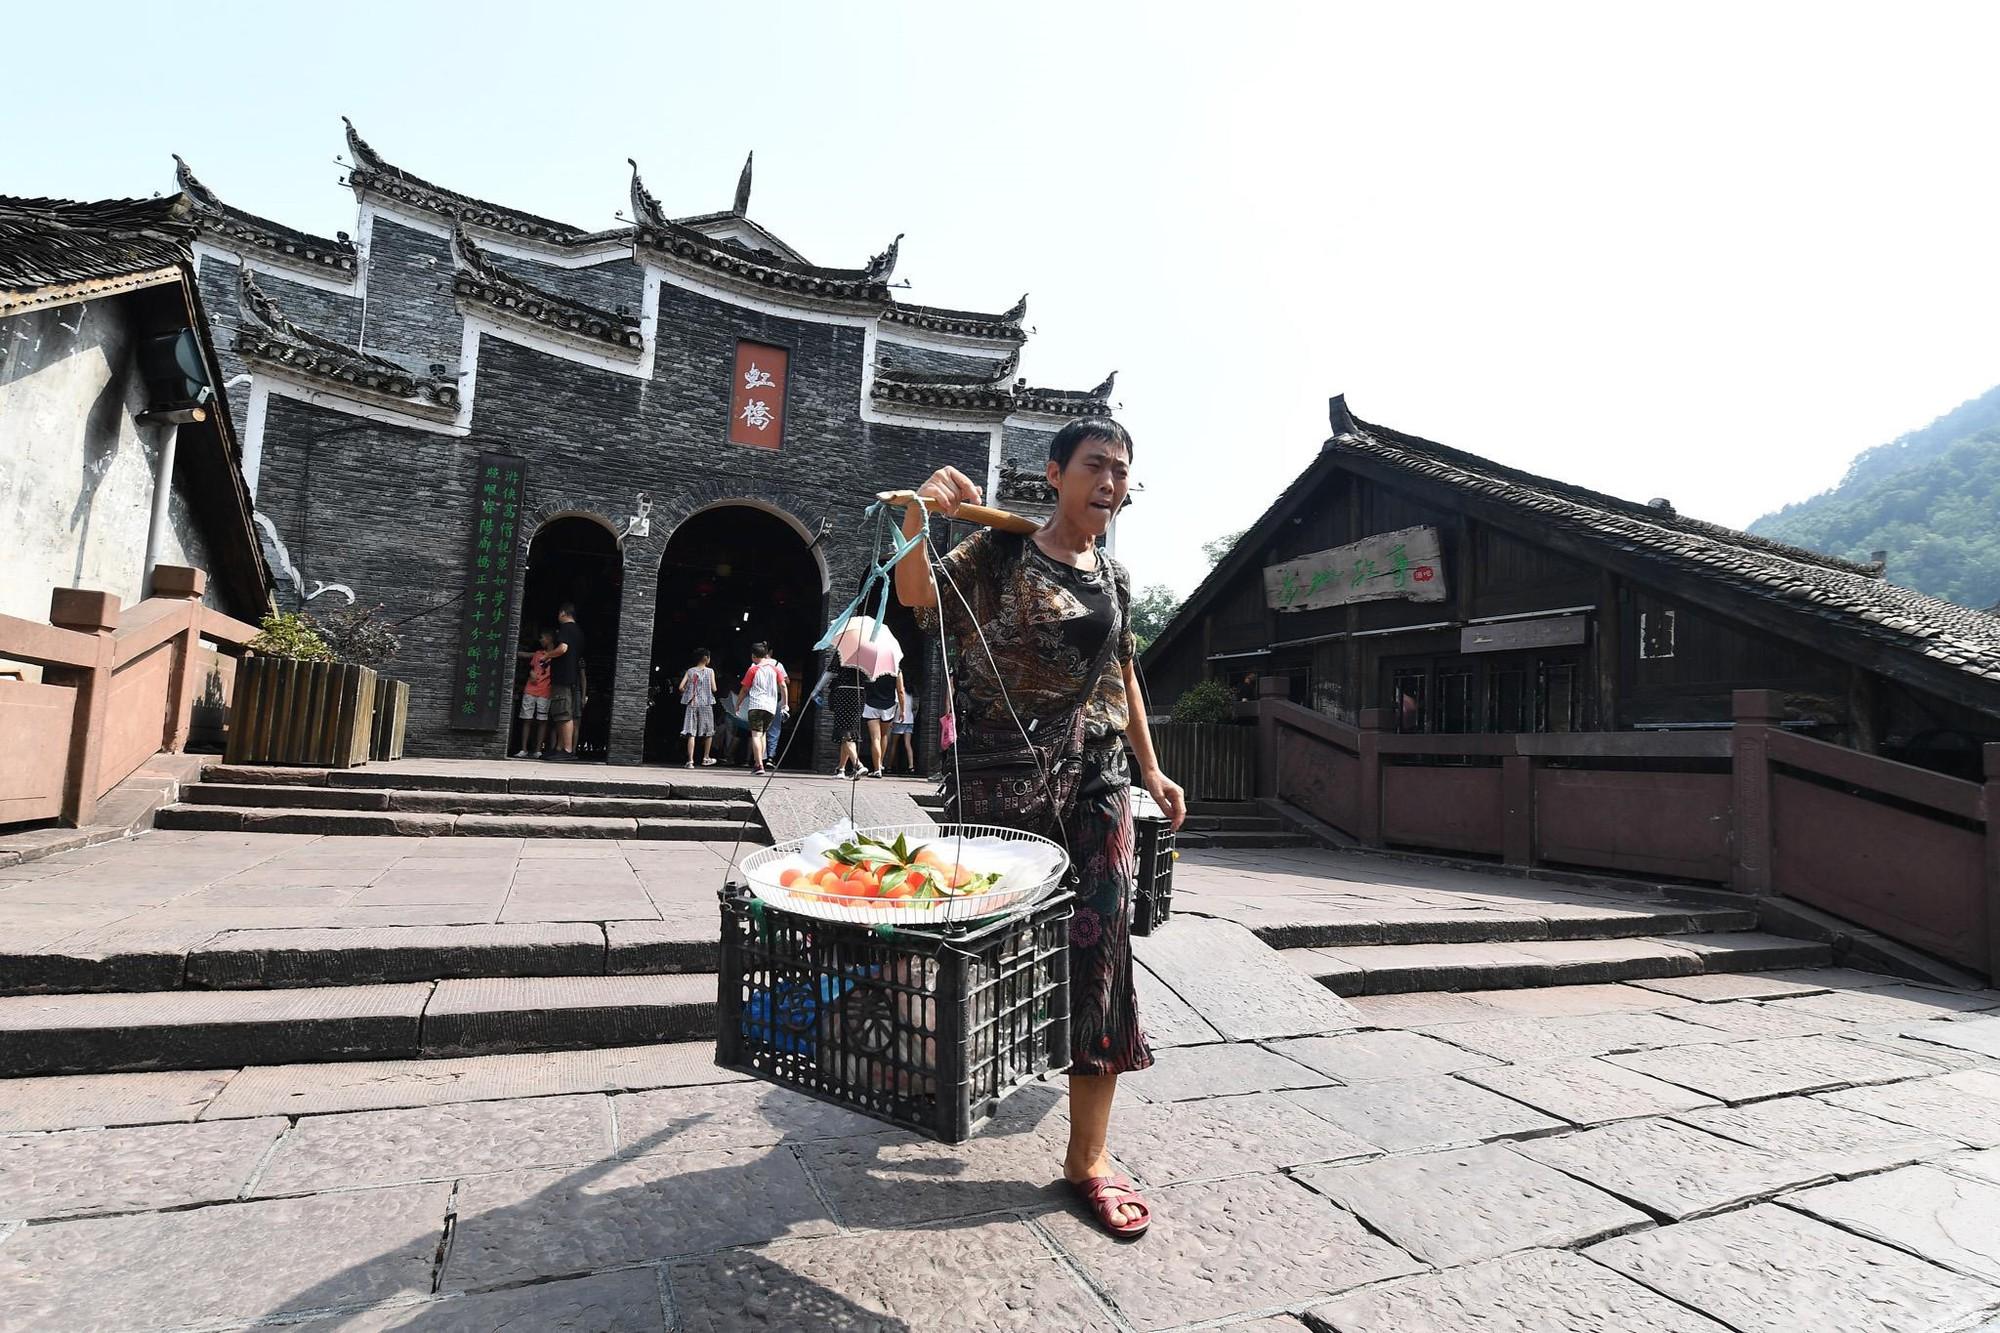 Phuong Hoang co tran va bi mat thu hut khach du lich quanh nam hinh anh 11